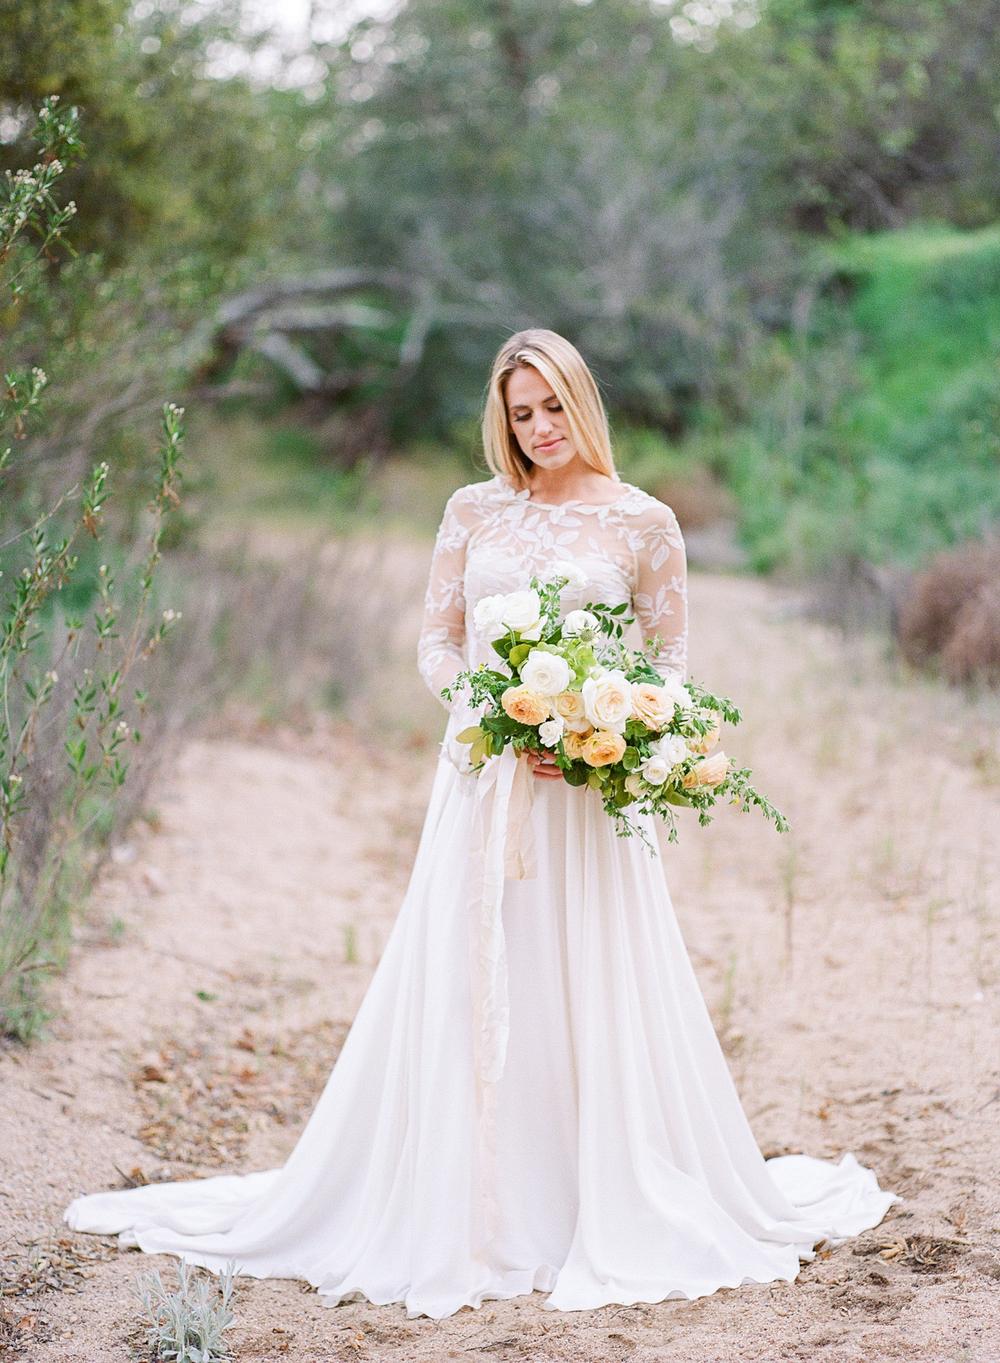 017-Jen-Wojcik-Photography-San-Diego-Photographer.jpg